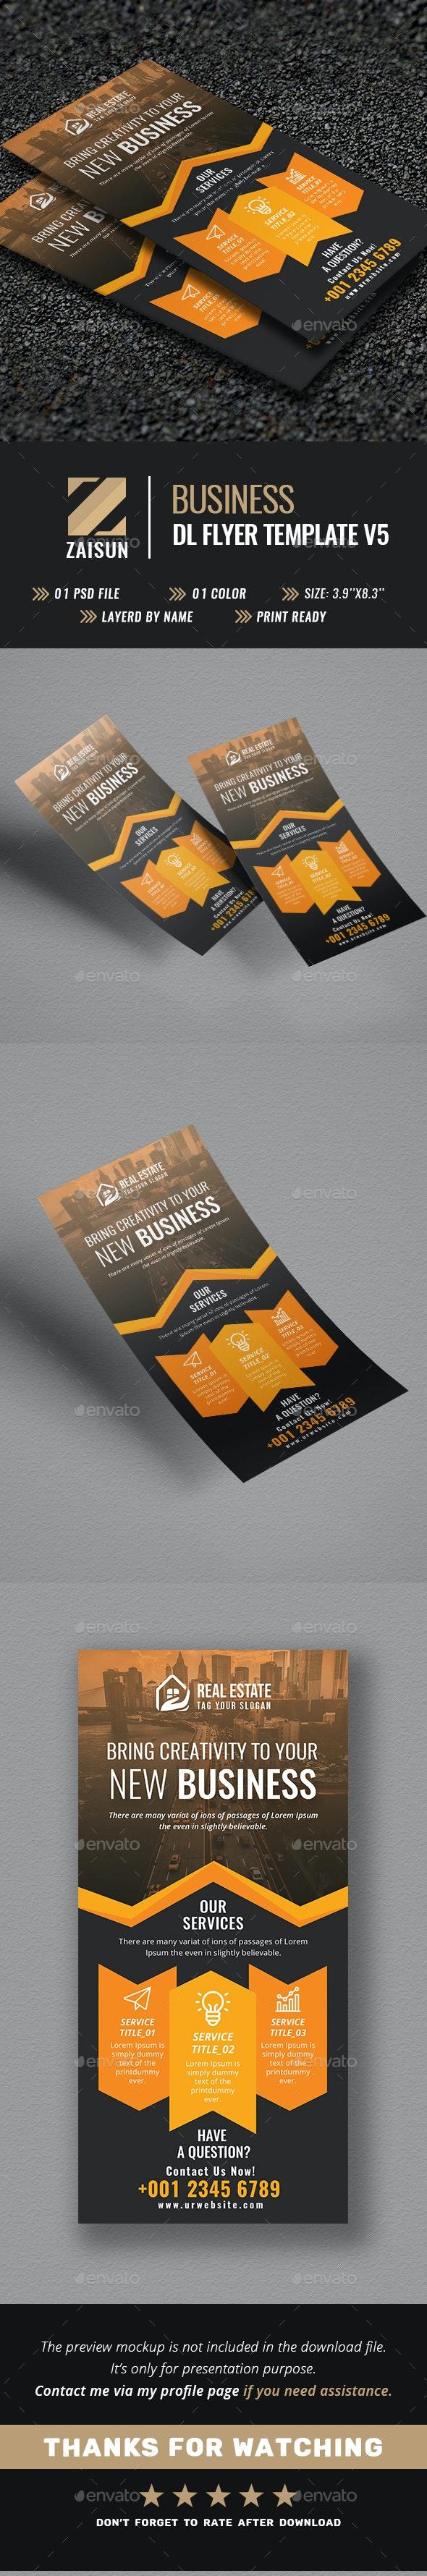 Business Dl Flyer V5 - Flyers Print Templates